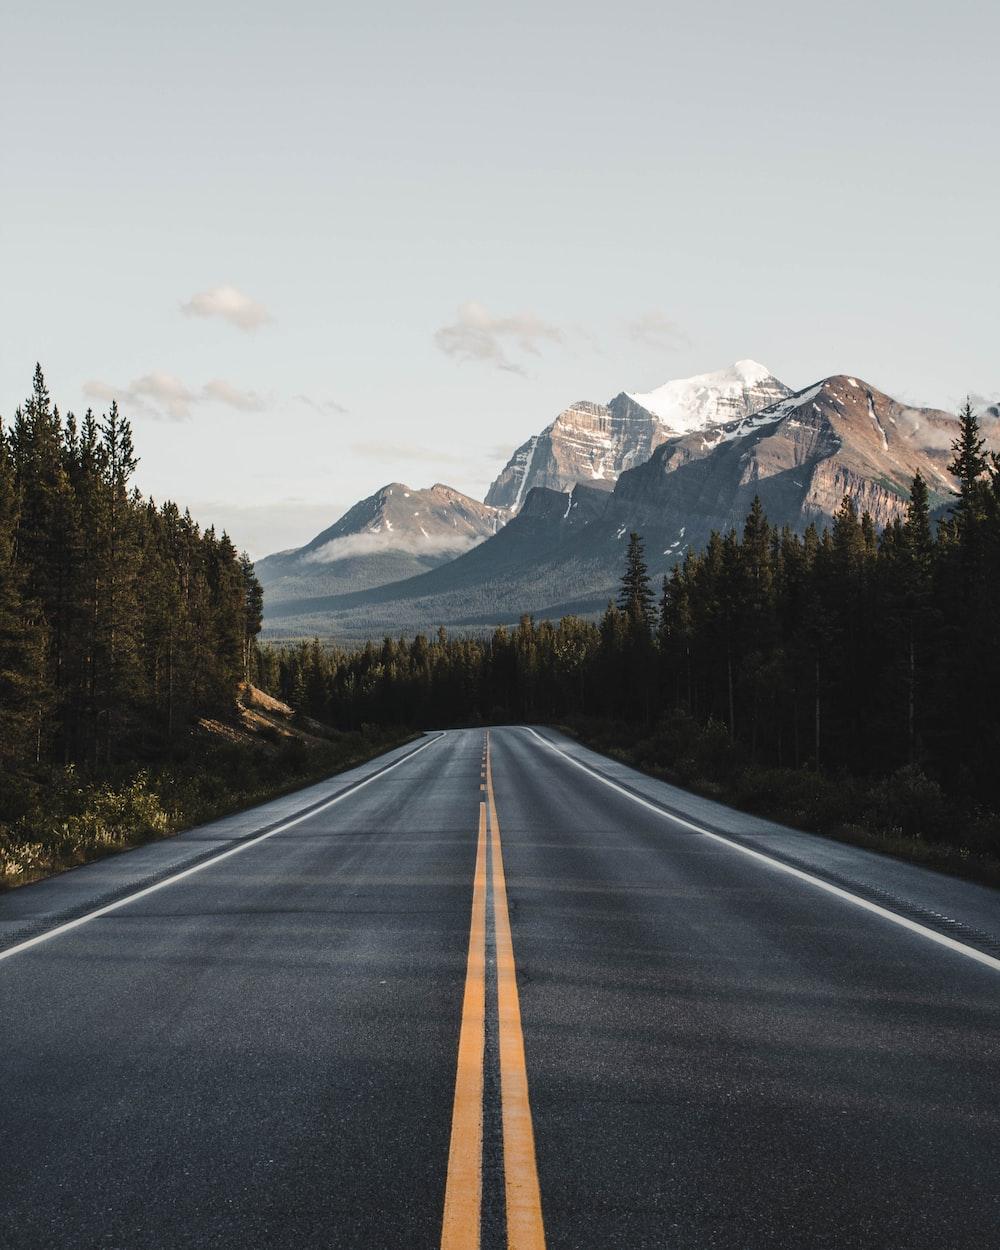 wide road under blue sky